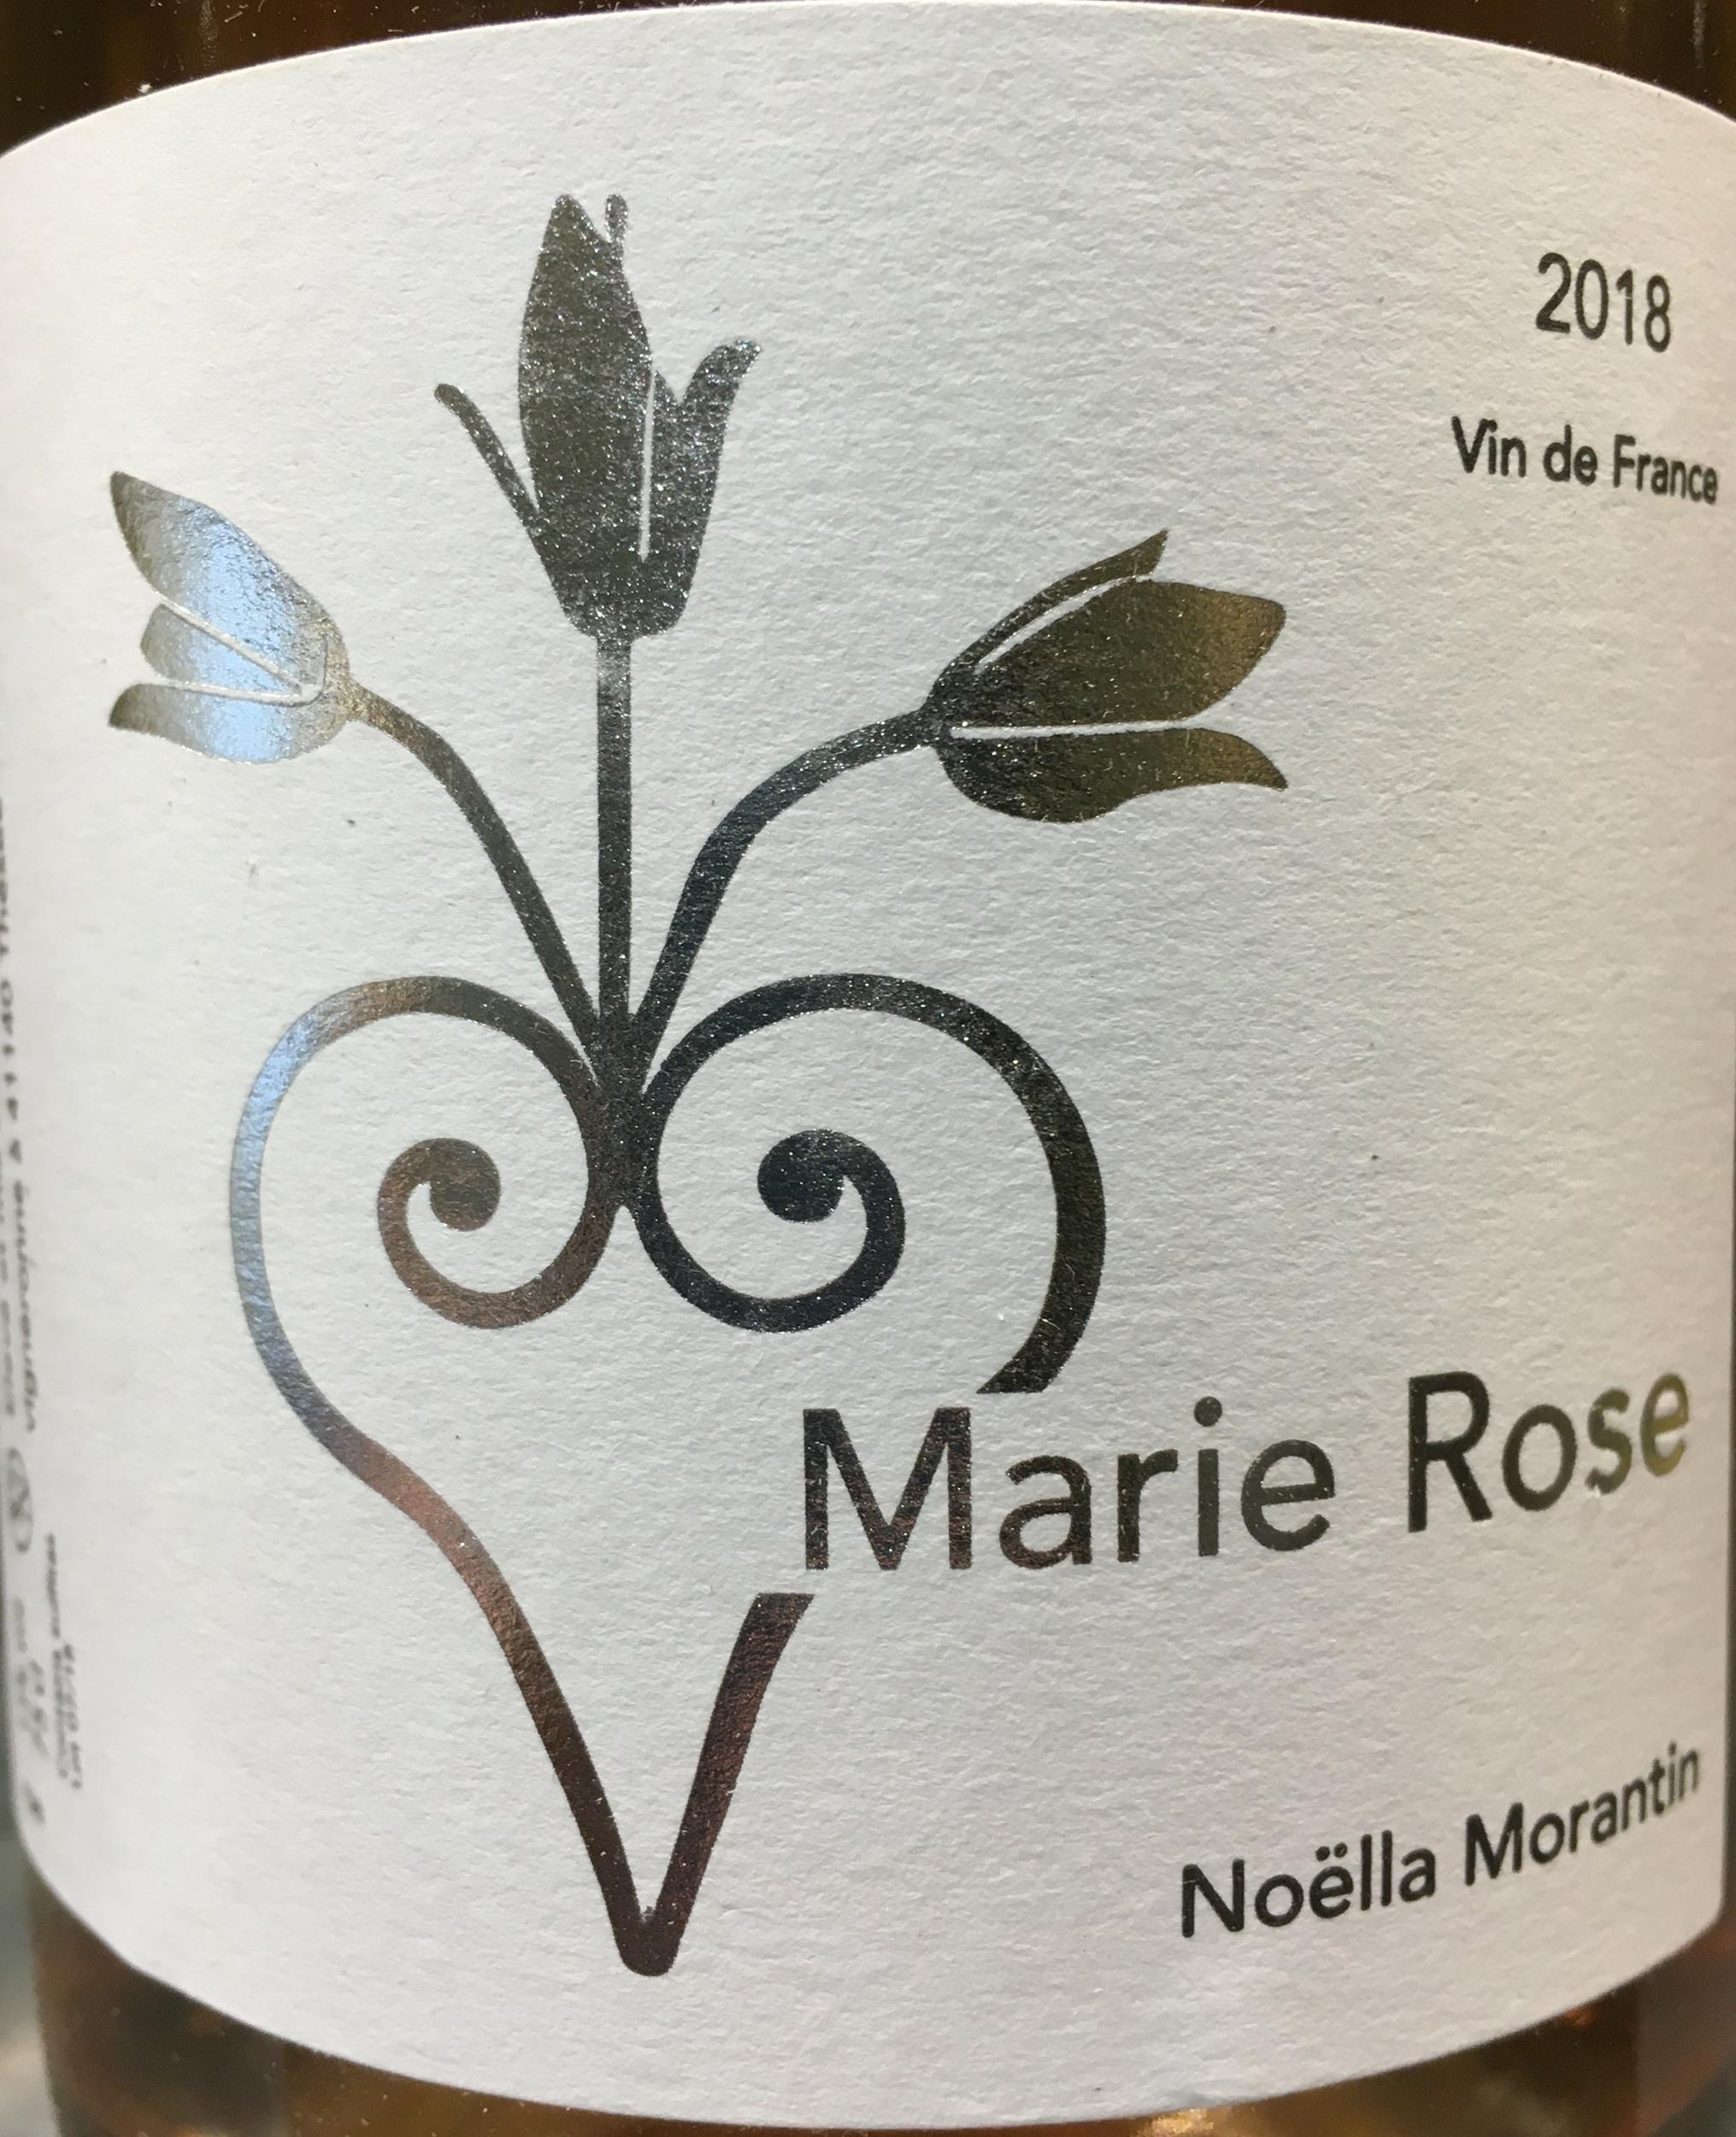 la nouvelle cave.marie rose.noella morantin.1